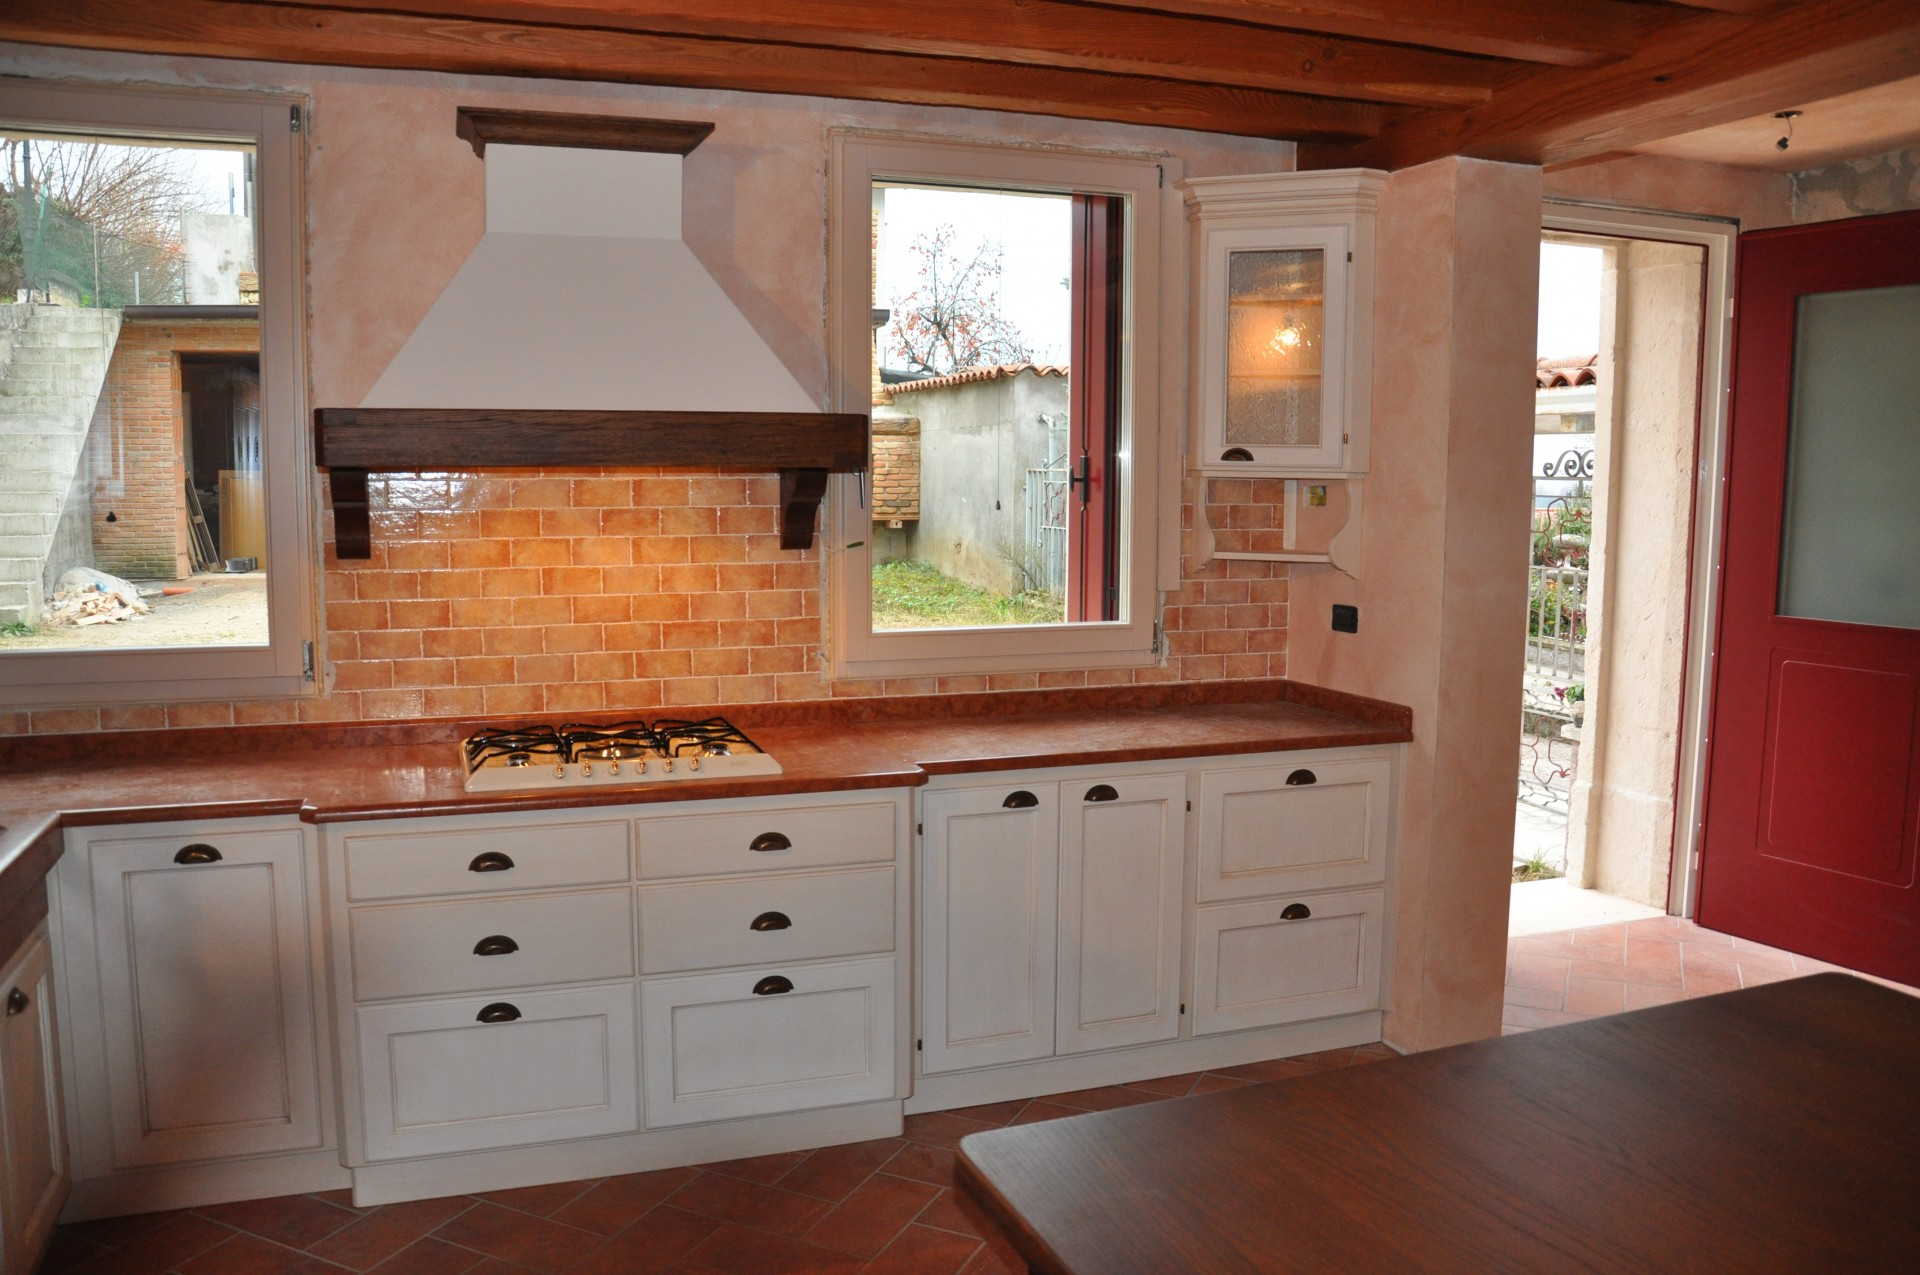 Cucina rustica laccata fadini mobili cerea verona - Cappa per cucina in muratura ...